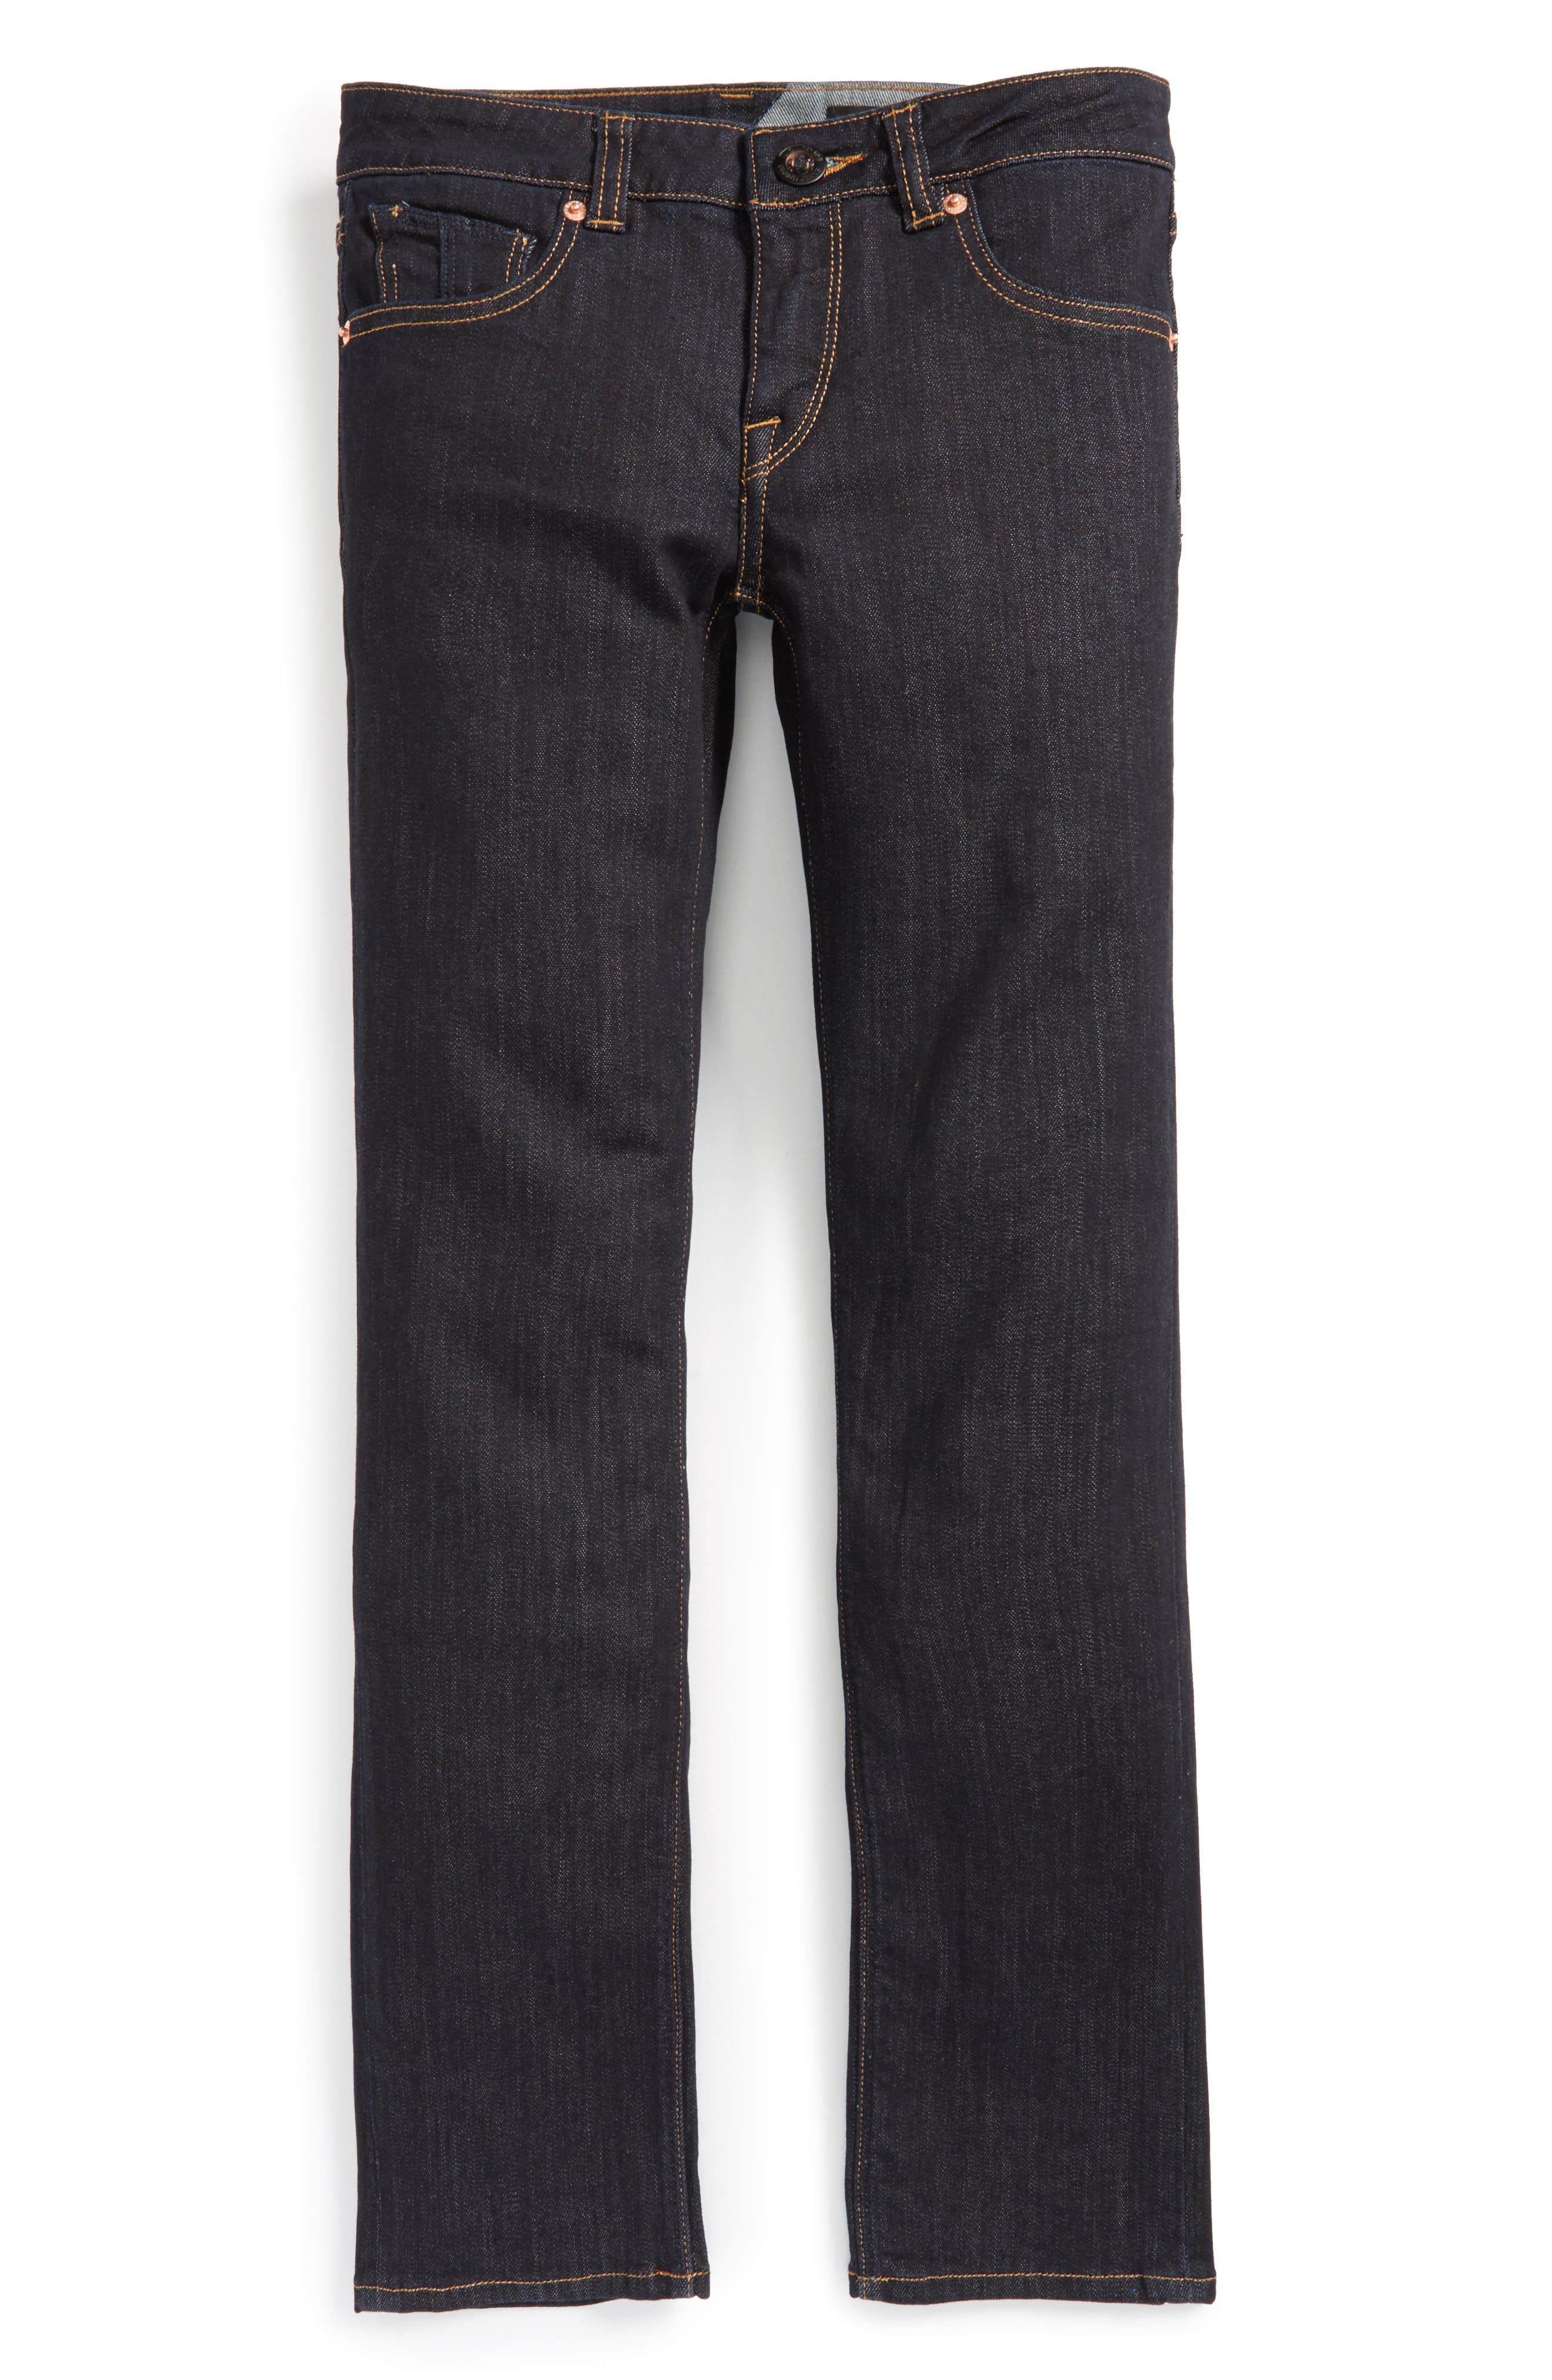 Vorta Slim Fit Jeans,                             Alternate thumbnail 5, color,                             BLUE RINSER